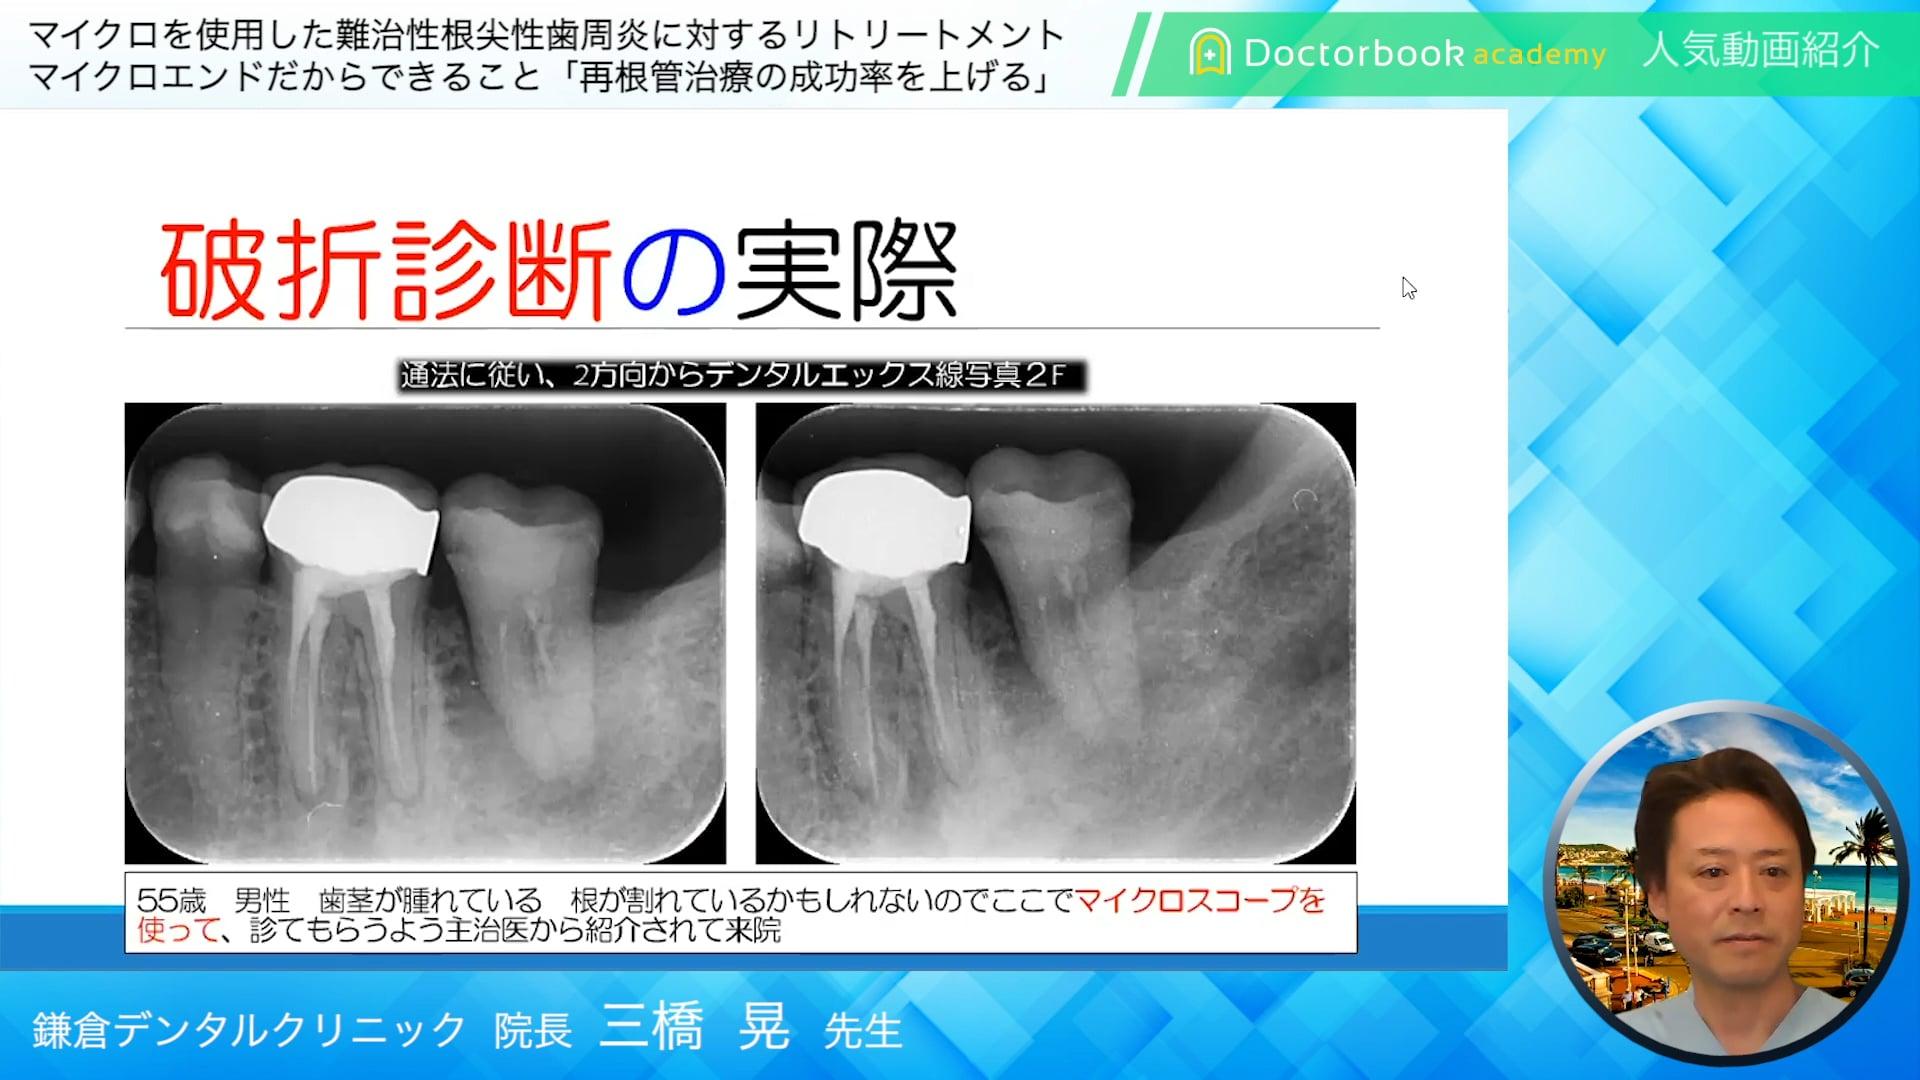 【Doctorbook academy 人気動画紹介】マイクロを使用した難治性根尖性歯周炎に対するリトリートメント